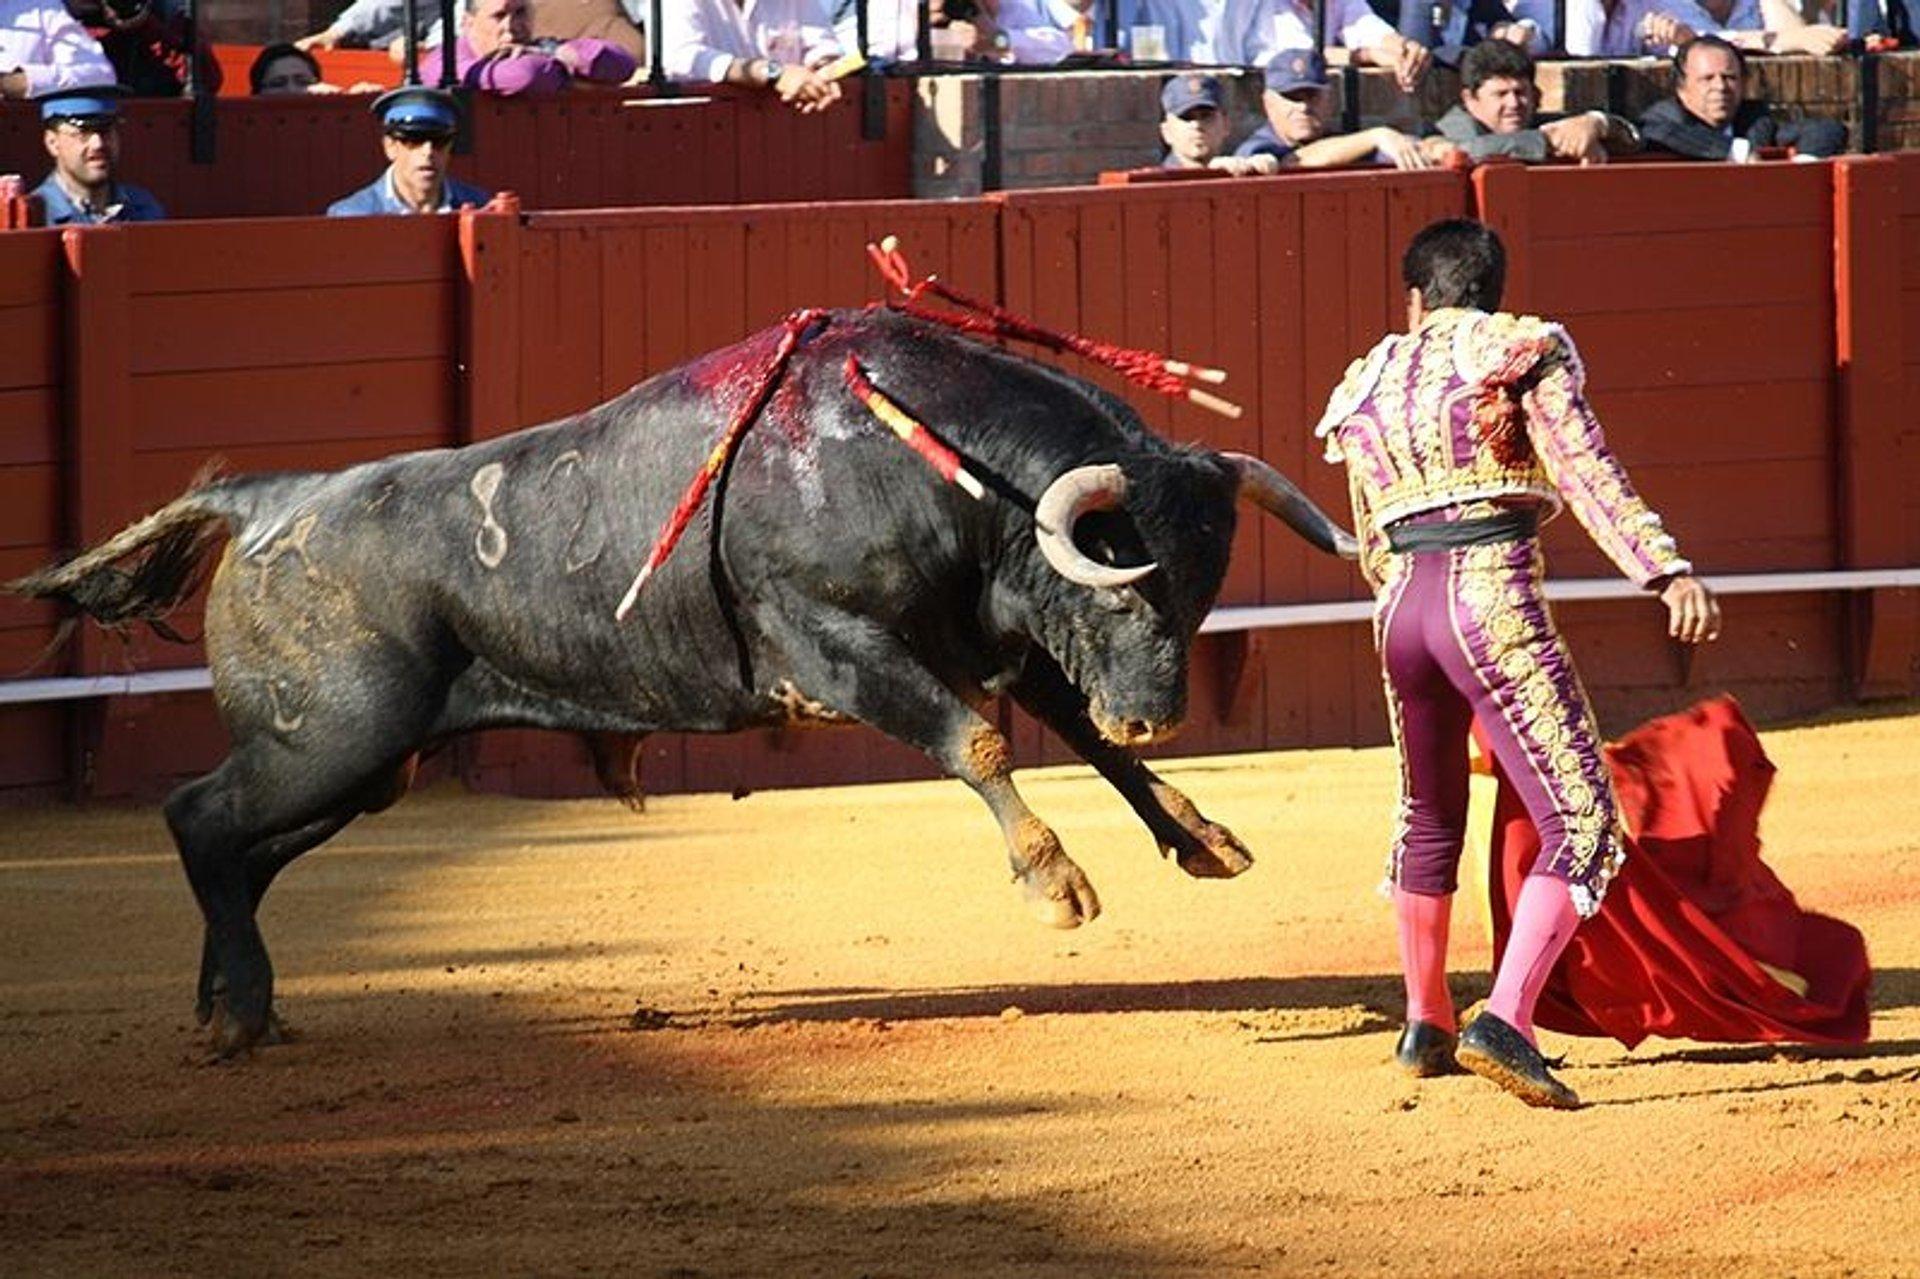 Bullfighting at La Maestranza in Seville - Best Season 2020